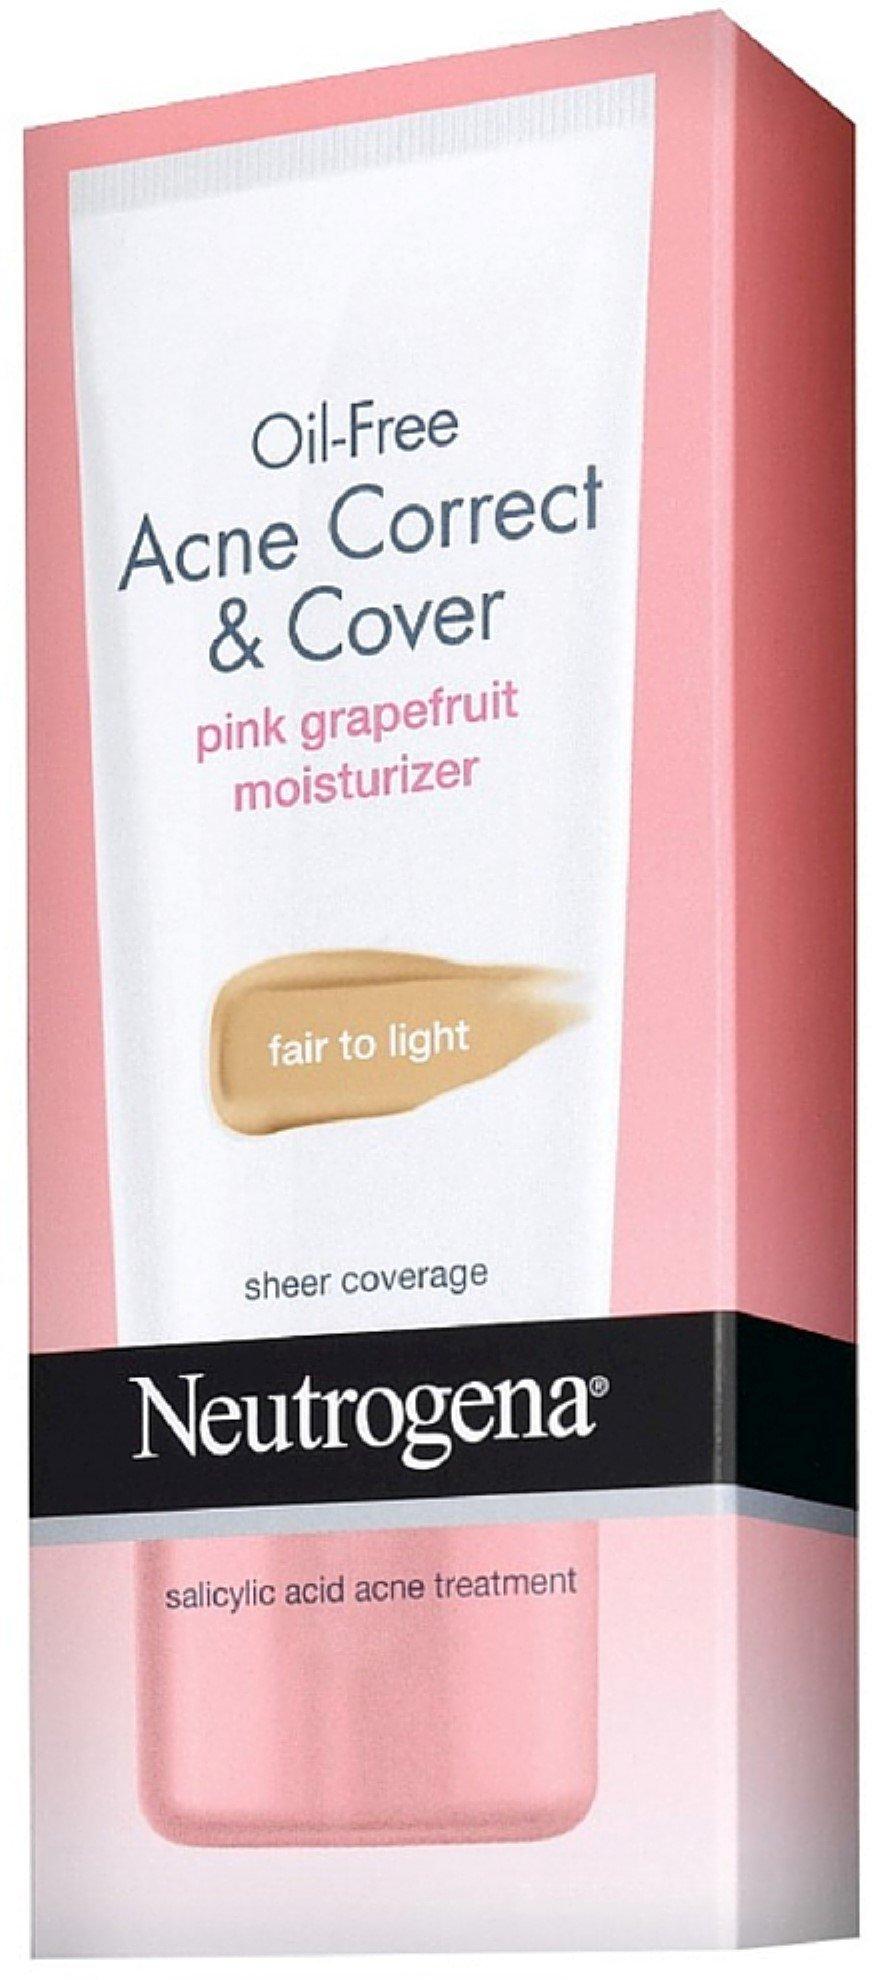 Neutrogena Oil-Free Acne Correct & Cover Pink Grapefruit Moisturizer, Fair to Light 1.7 oz (12 Pack)